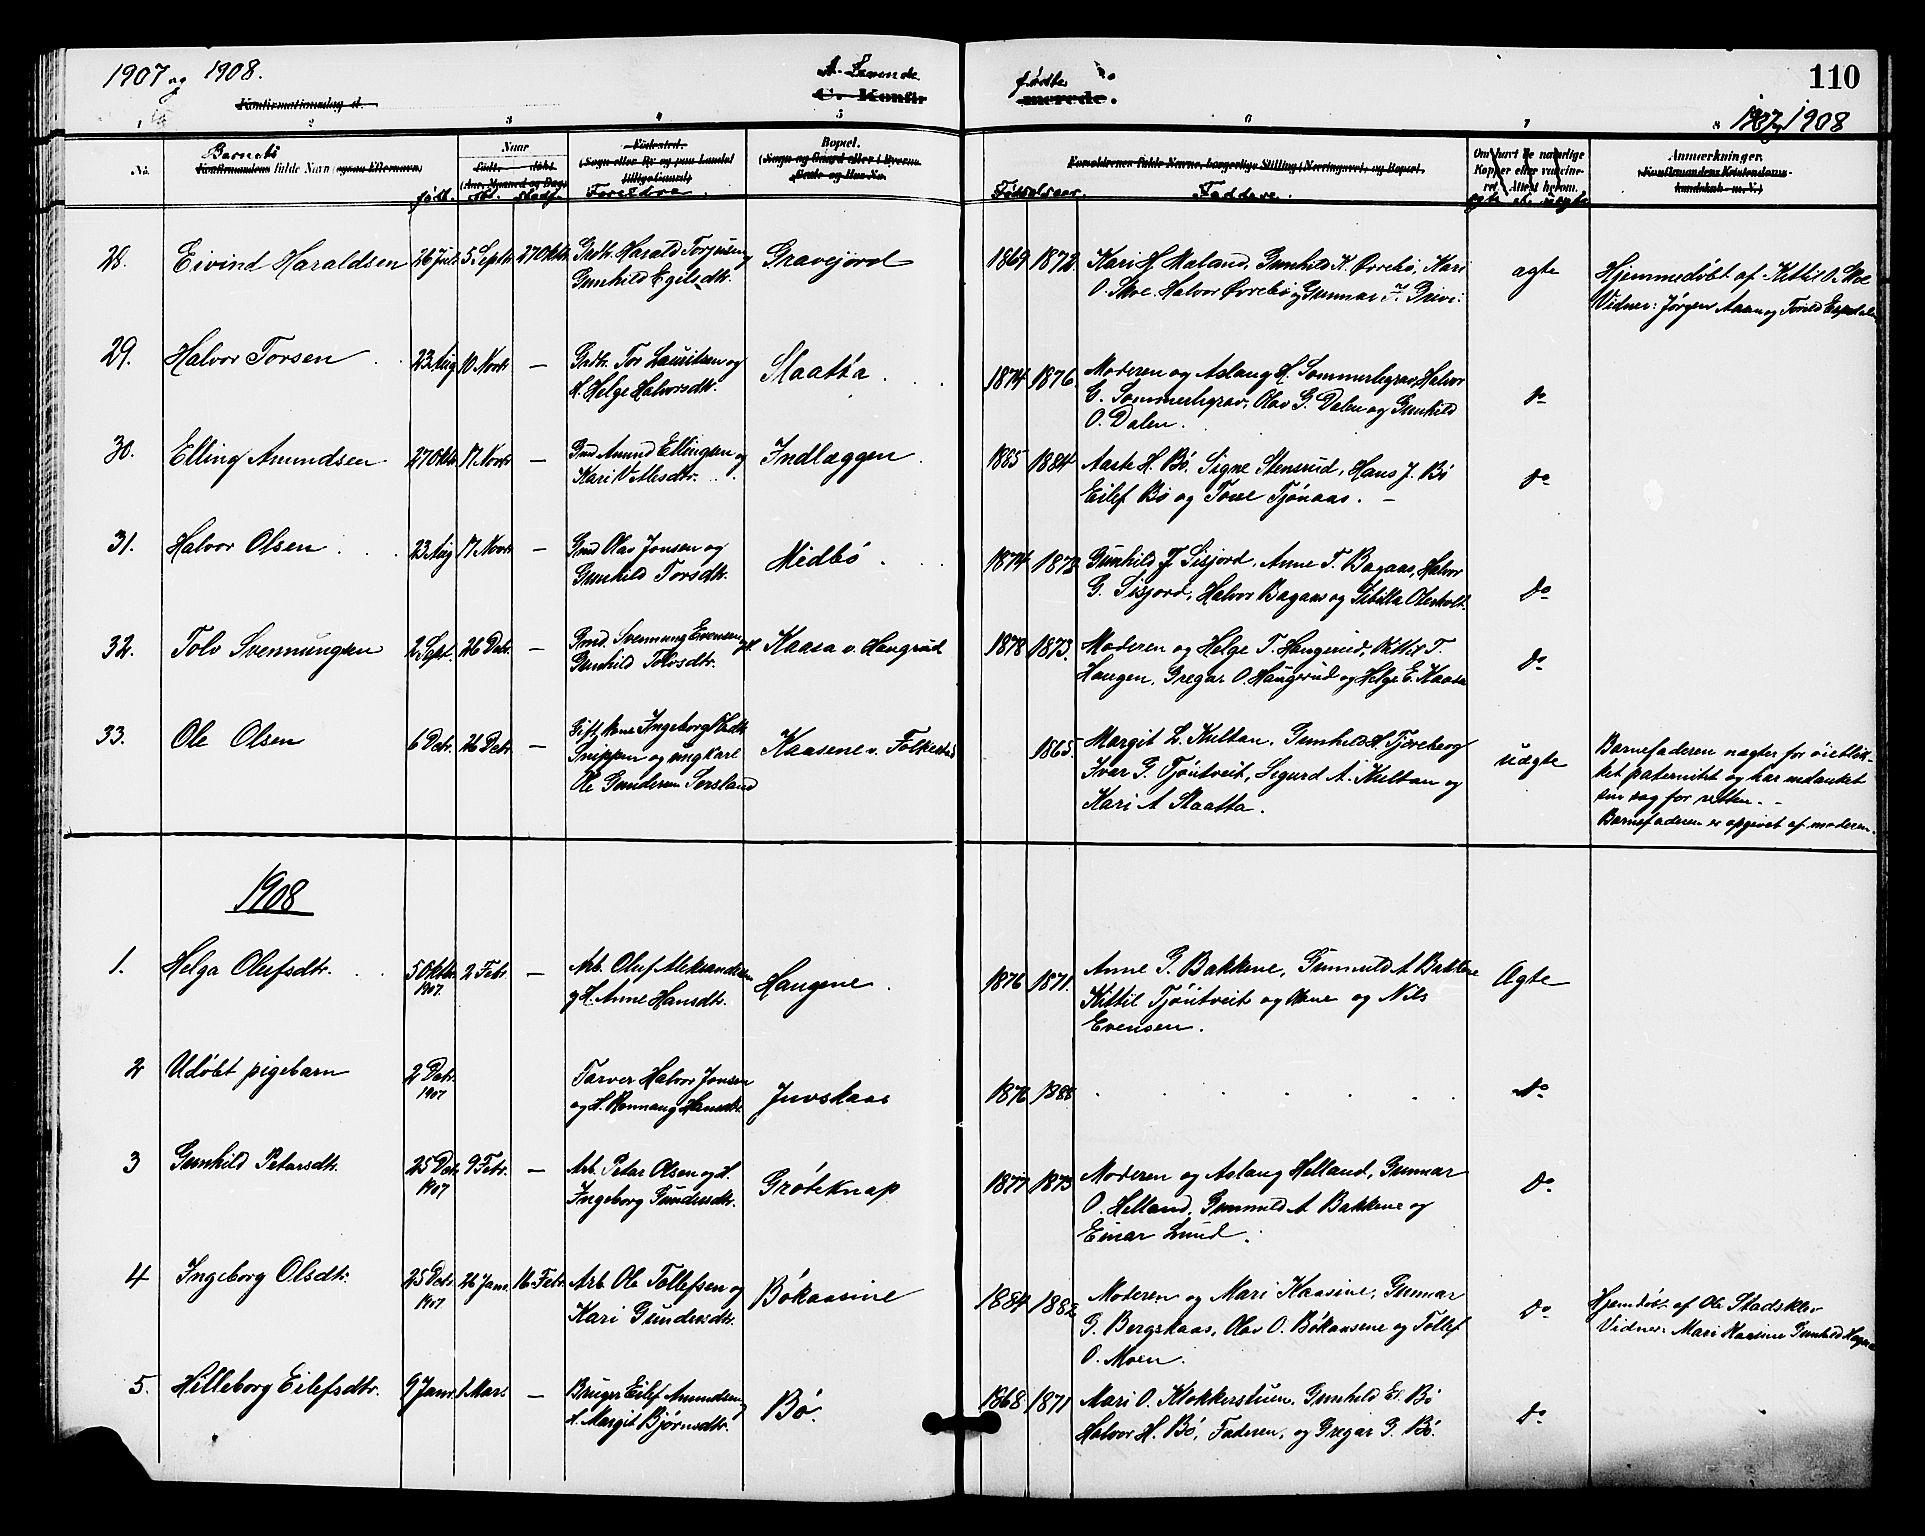 SAKO, Bø kirkebøker, G/Ga/L0006: Klokkerbok nr. 6, 1898-1909, s. 110